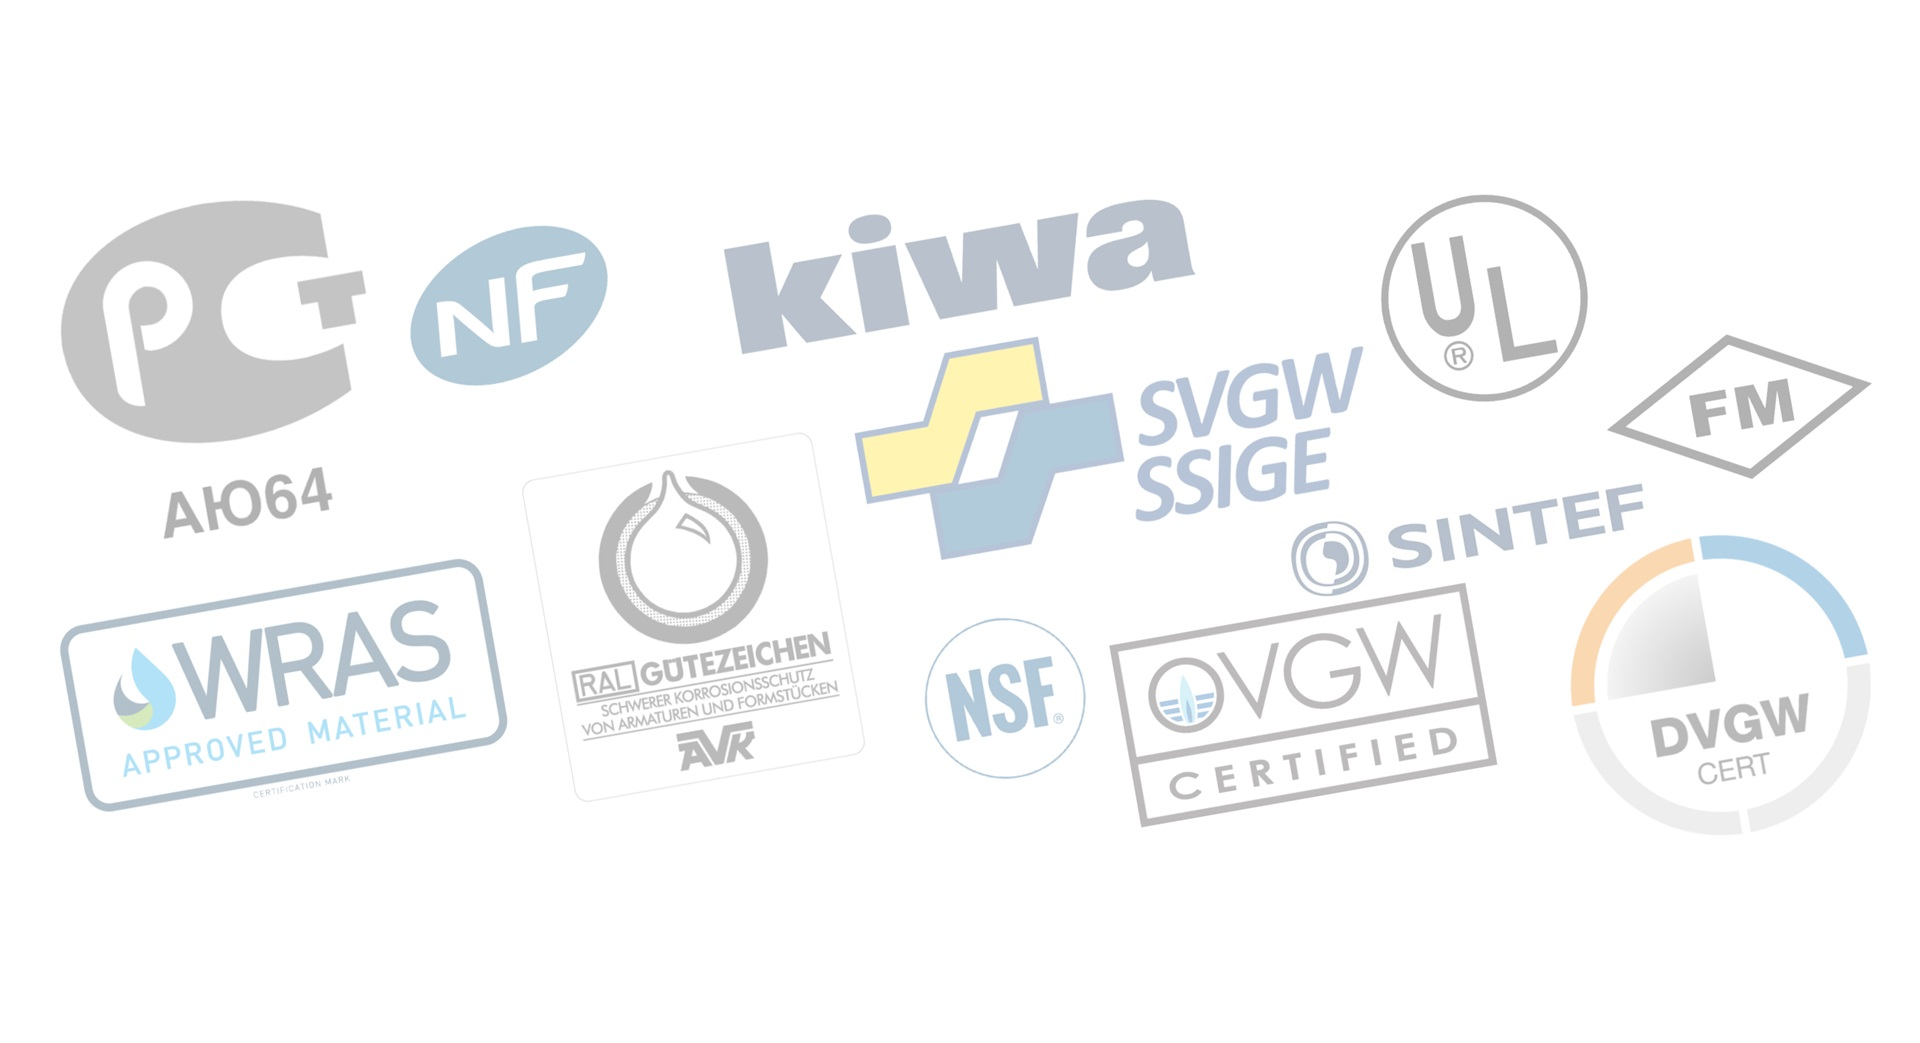 Logoer fra tredjepartsgodkendelser af AVK-produkter